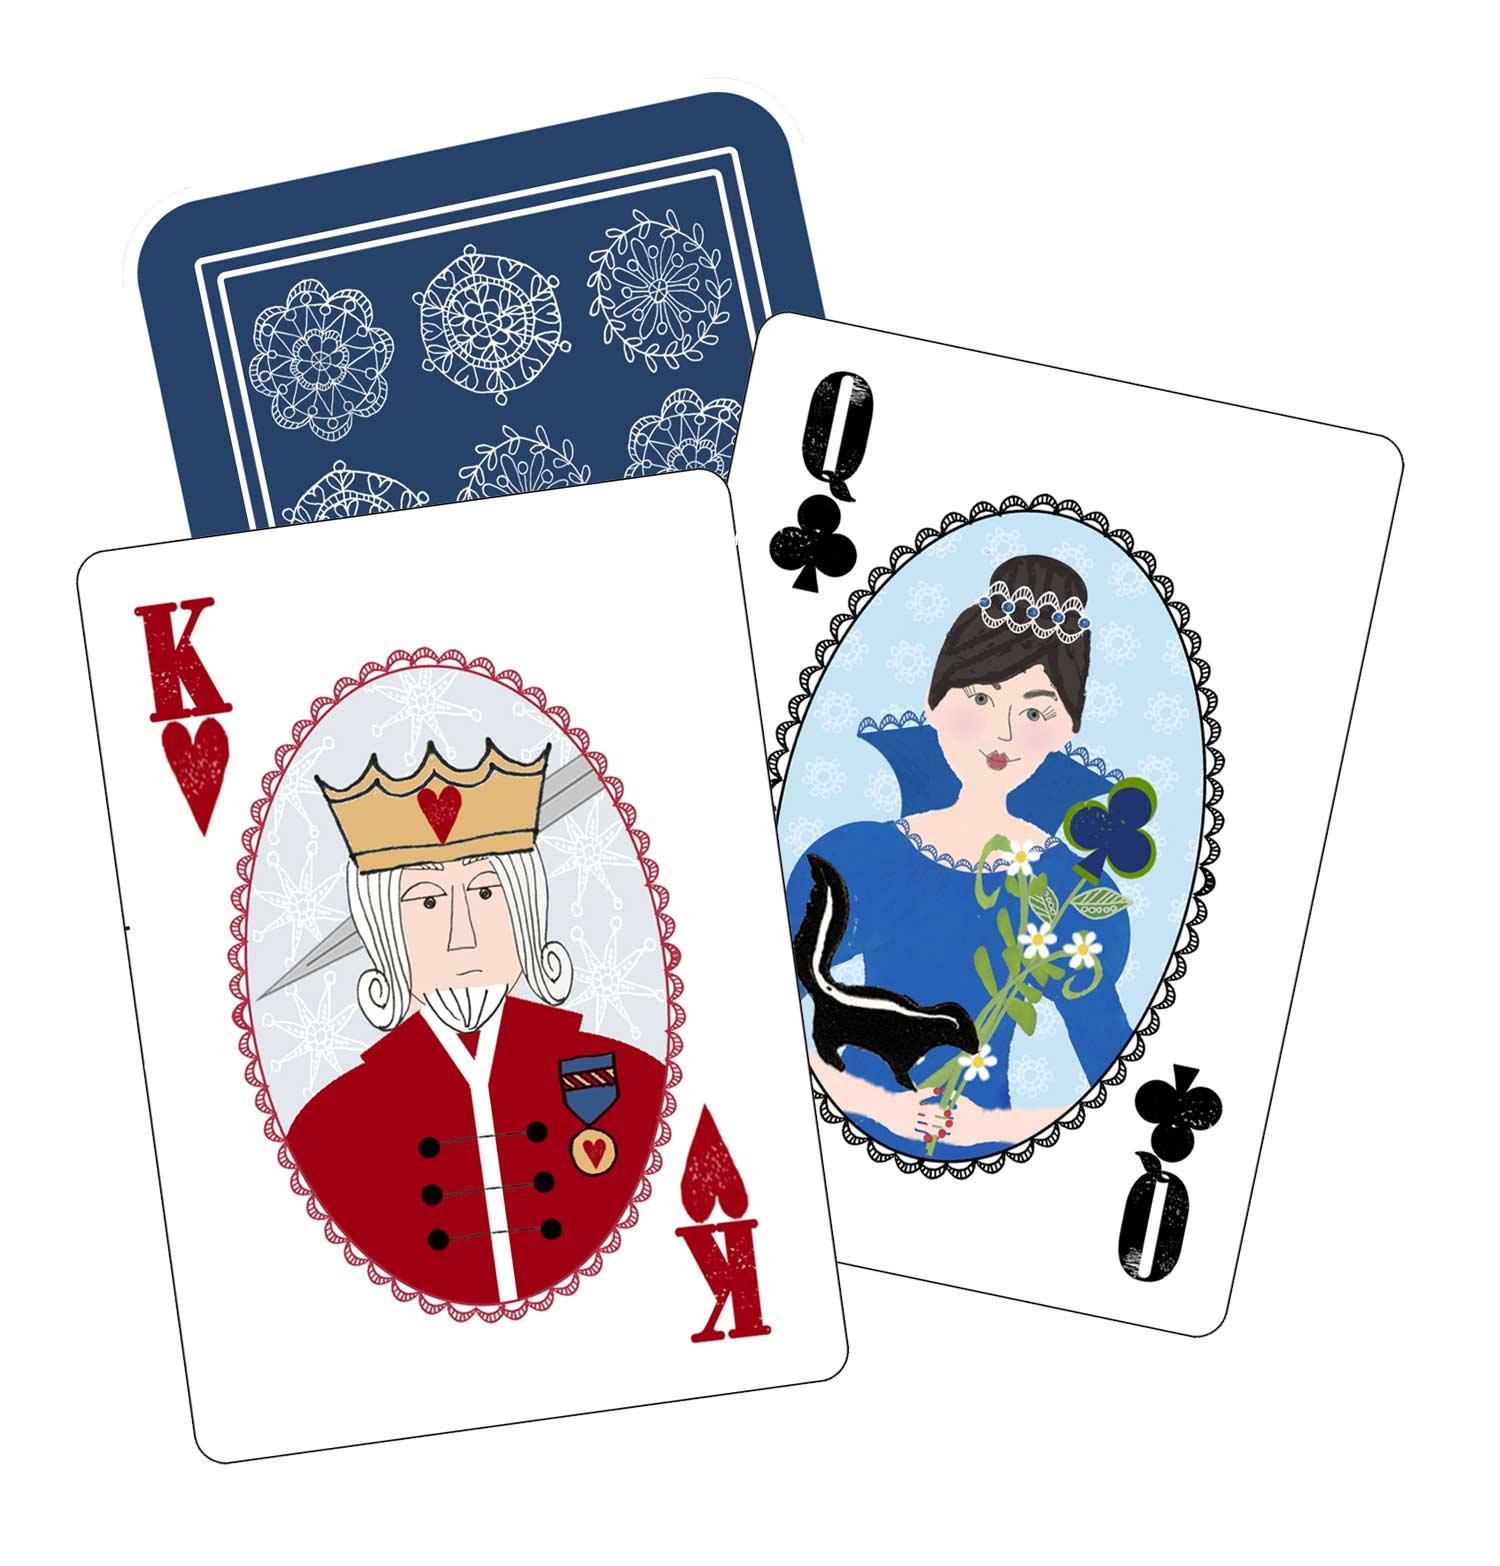 card-image.jpg